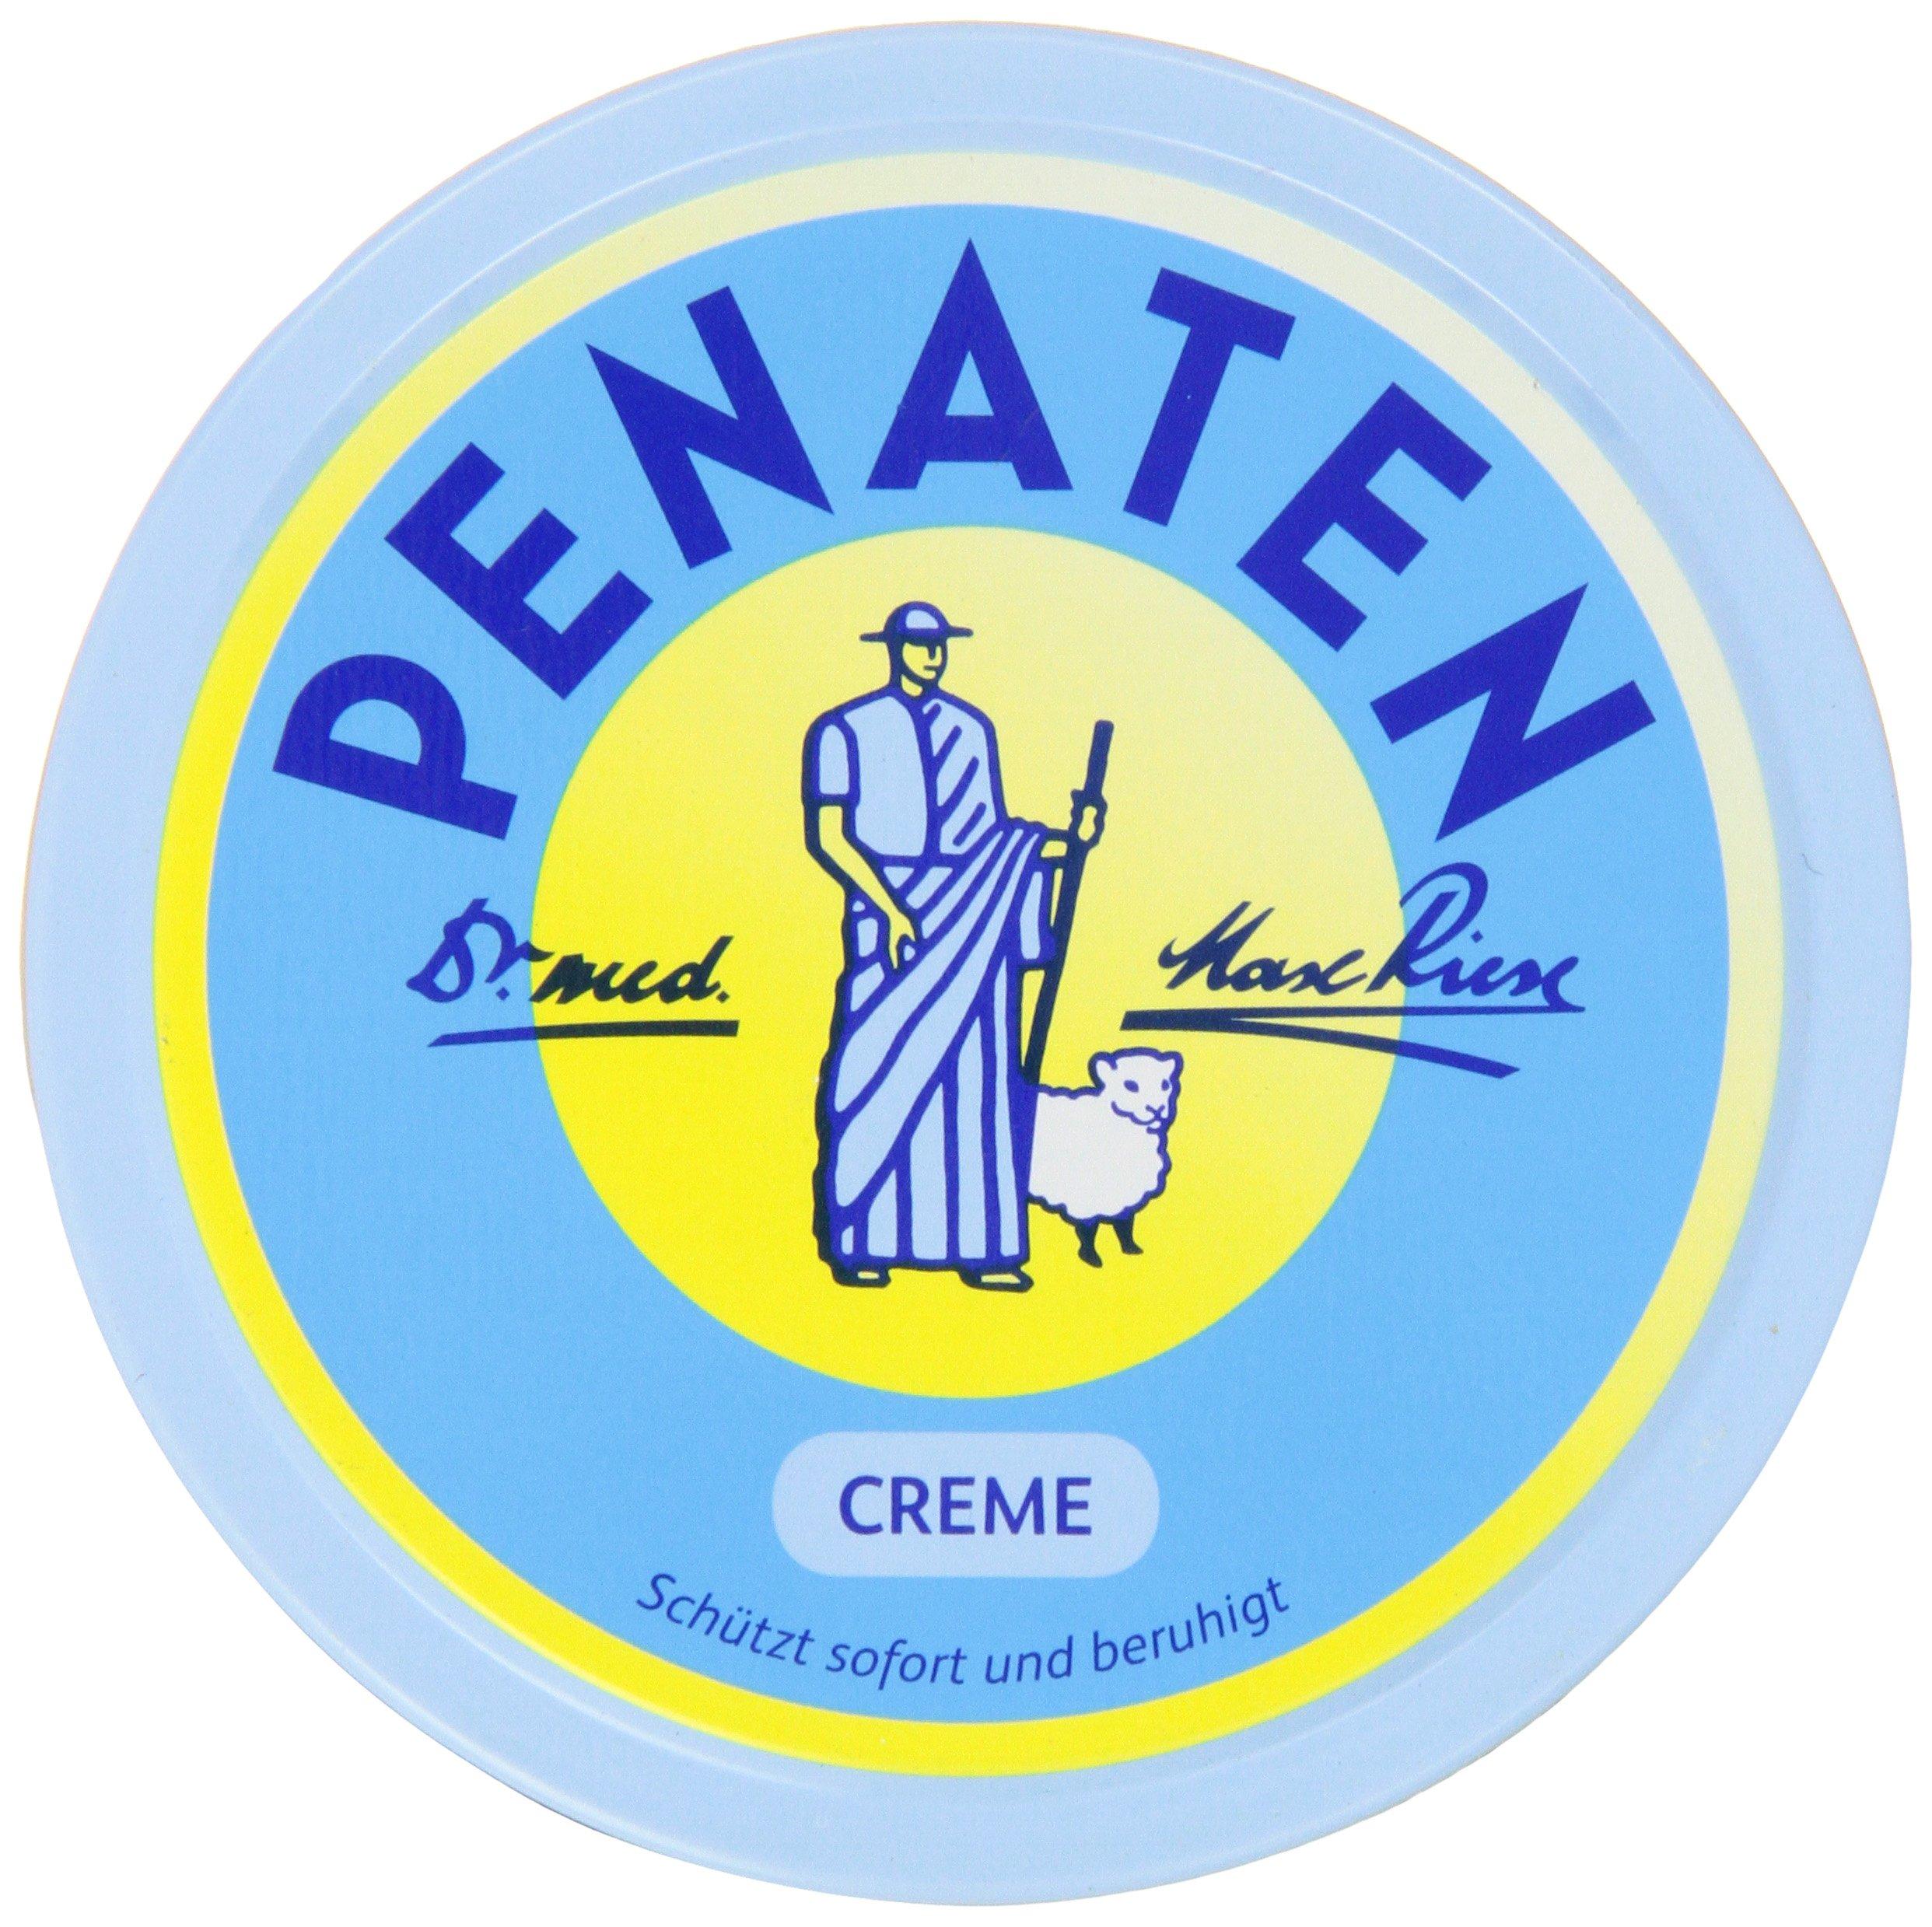 Penaten Baby Cream Crème Large, 5.1-Ounce